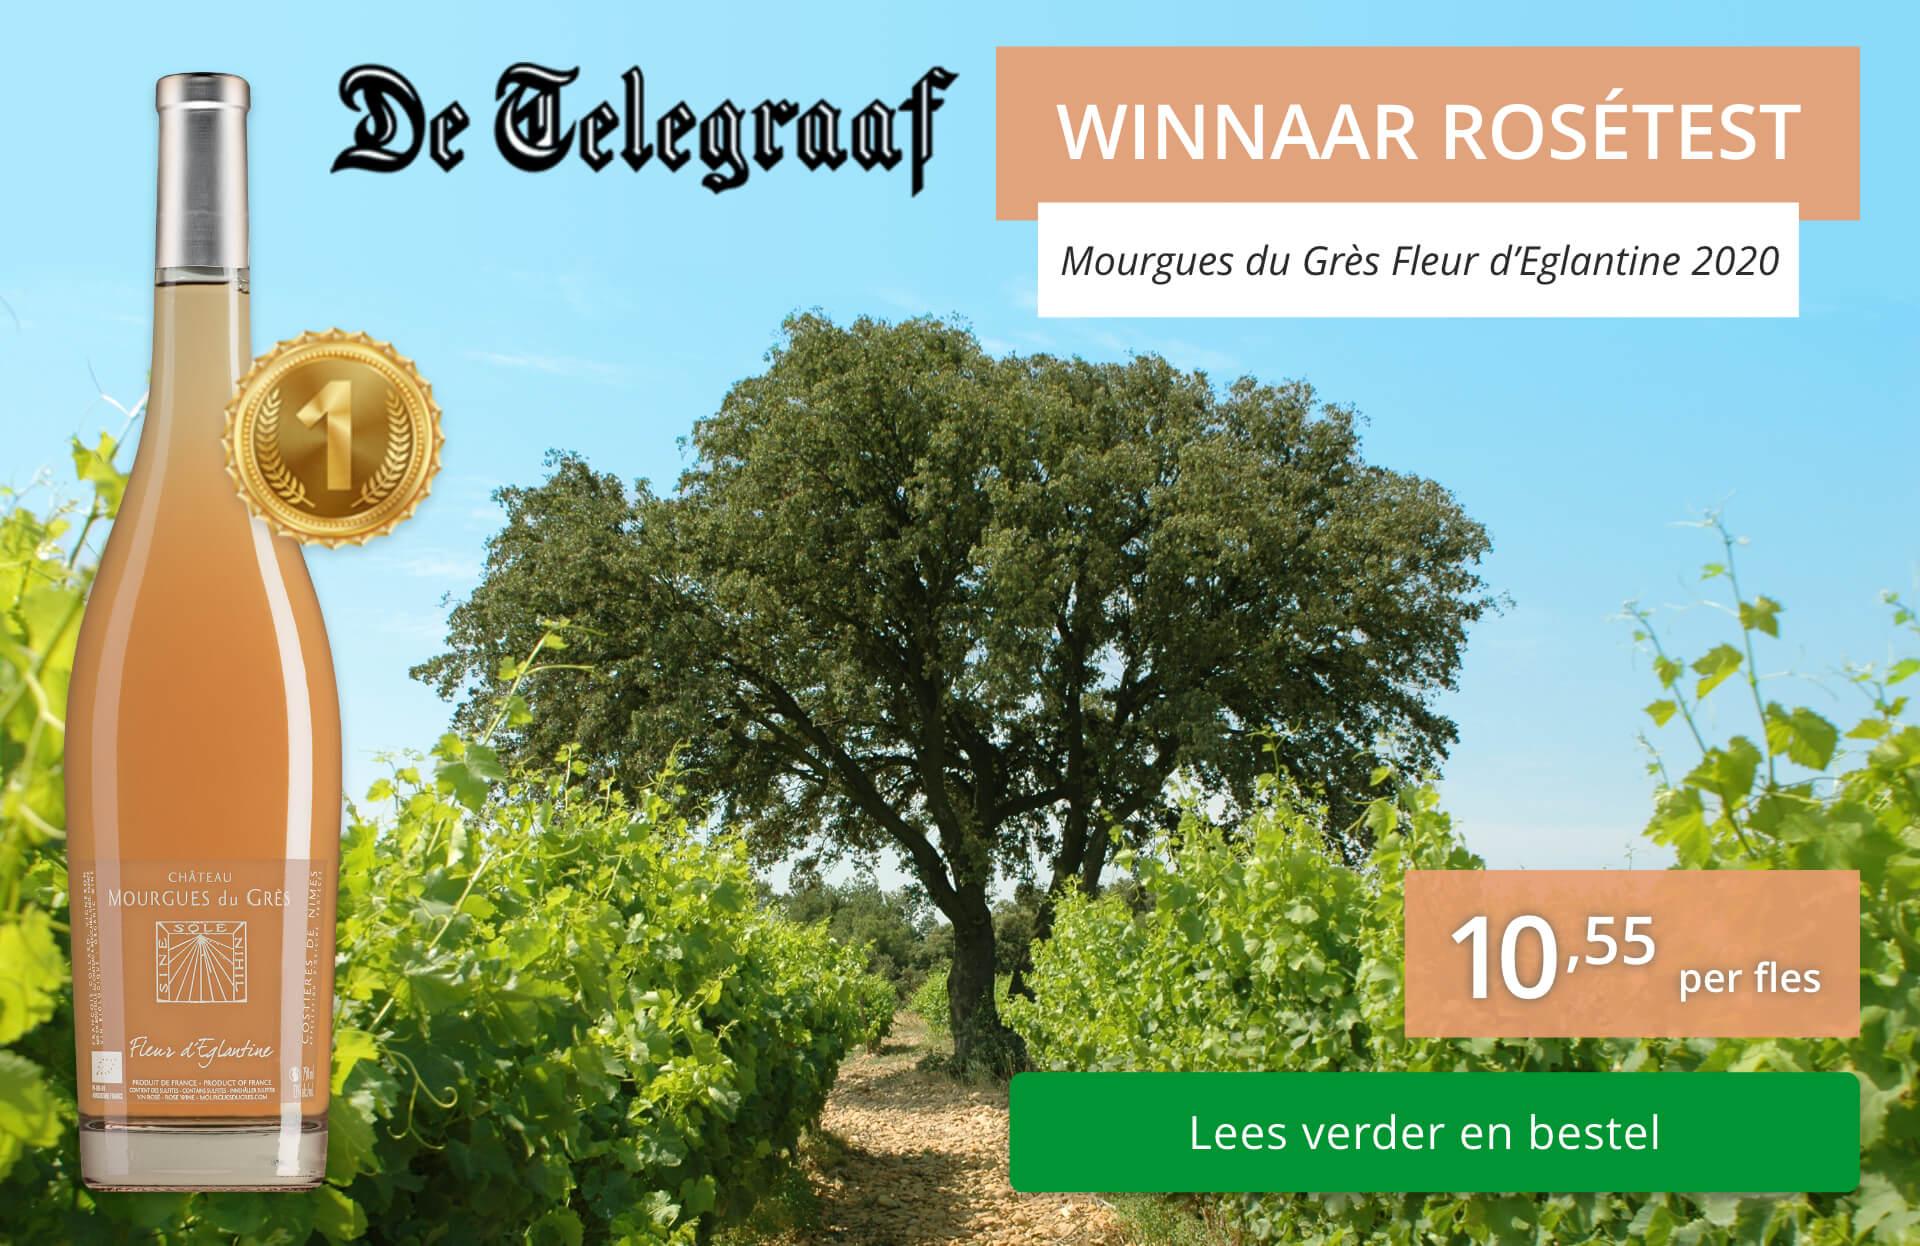 Nummer 1 in rosé test van de Telegraaf - Mourgues du Grès Fleur d'Eglantine